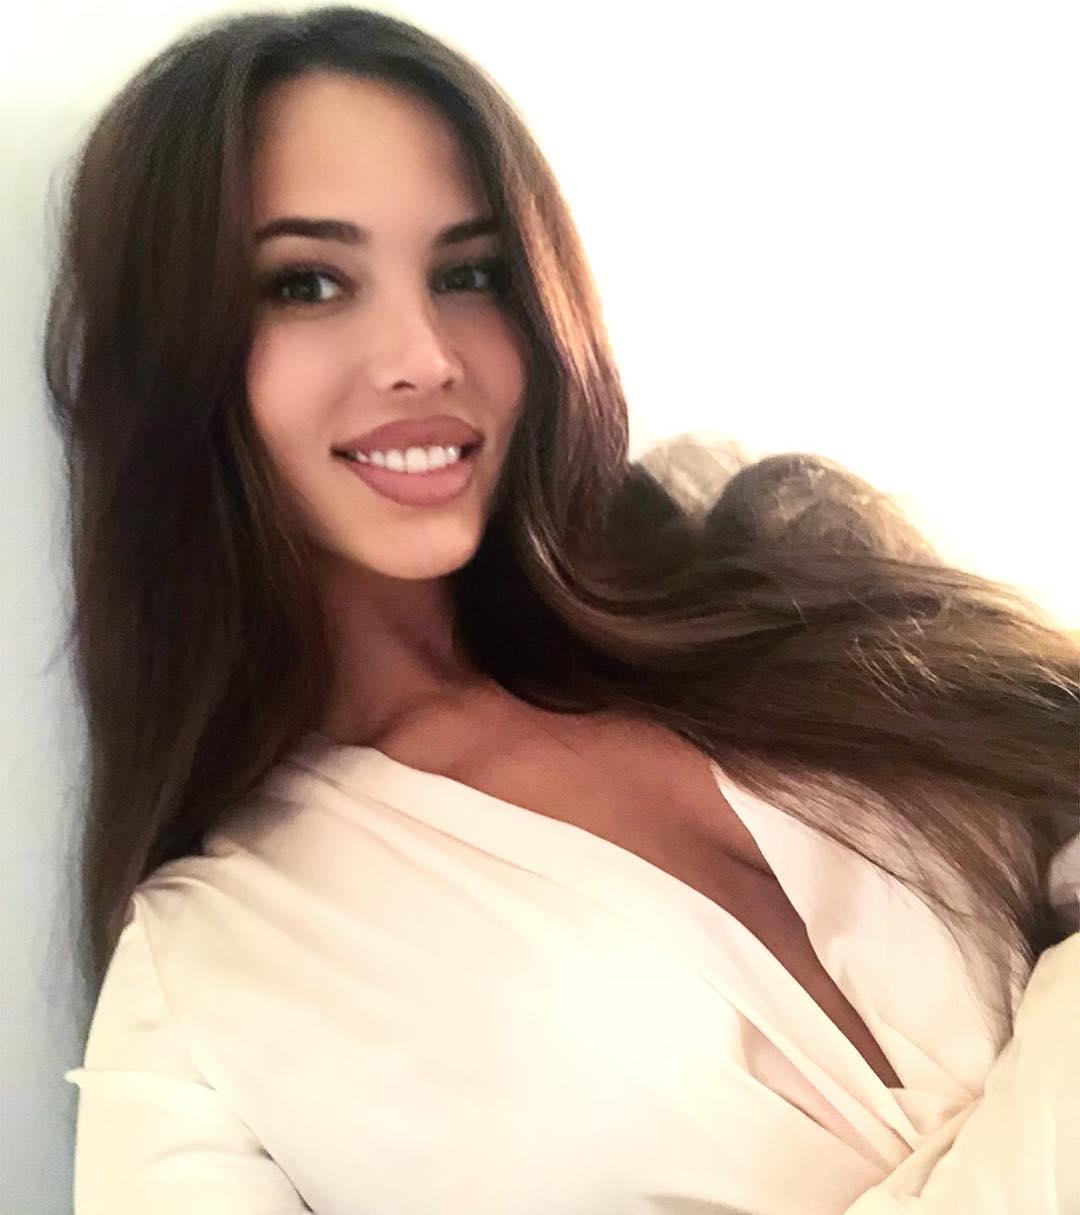 Анастасия Решетова: Вам тут улыбка на всякий случай